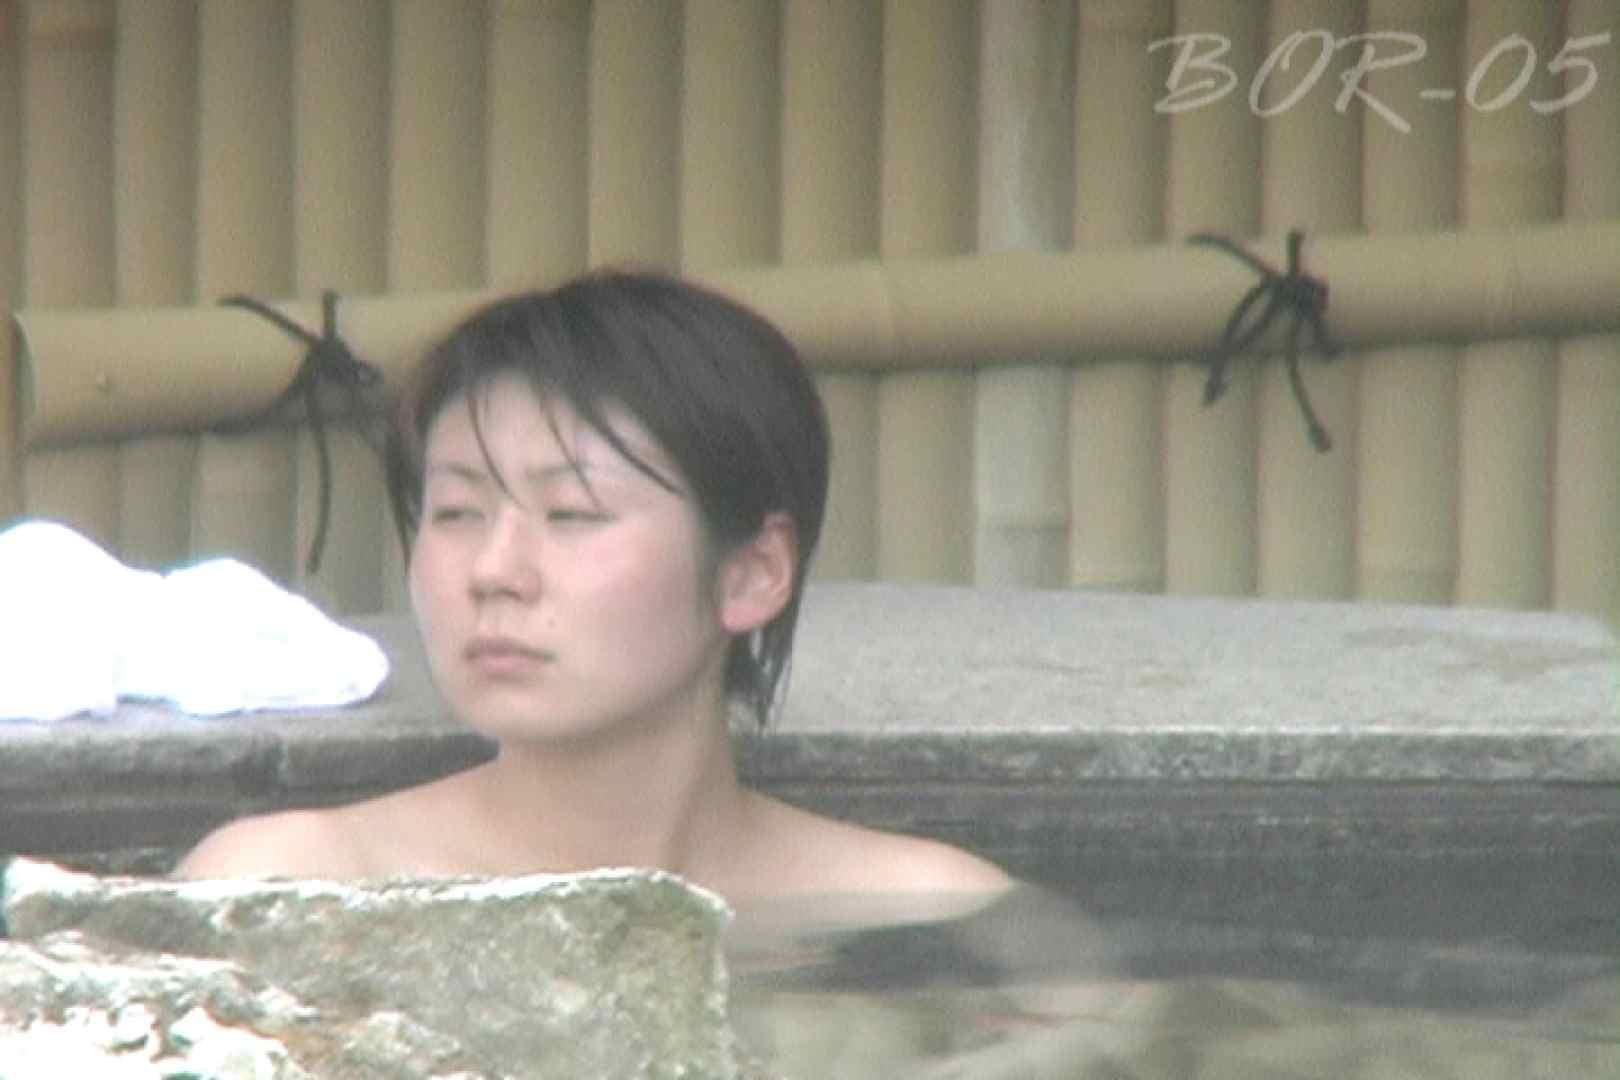 Aquaな露天風呂Vol.493 盗撮 AV無料動画キャプチャ 67PICs 41